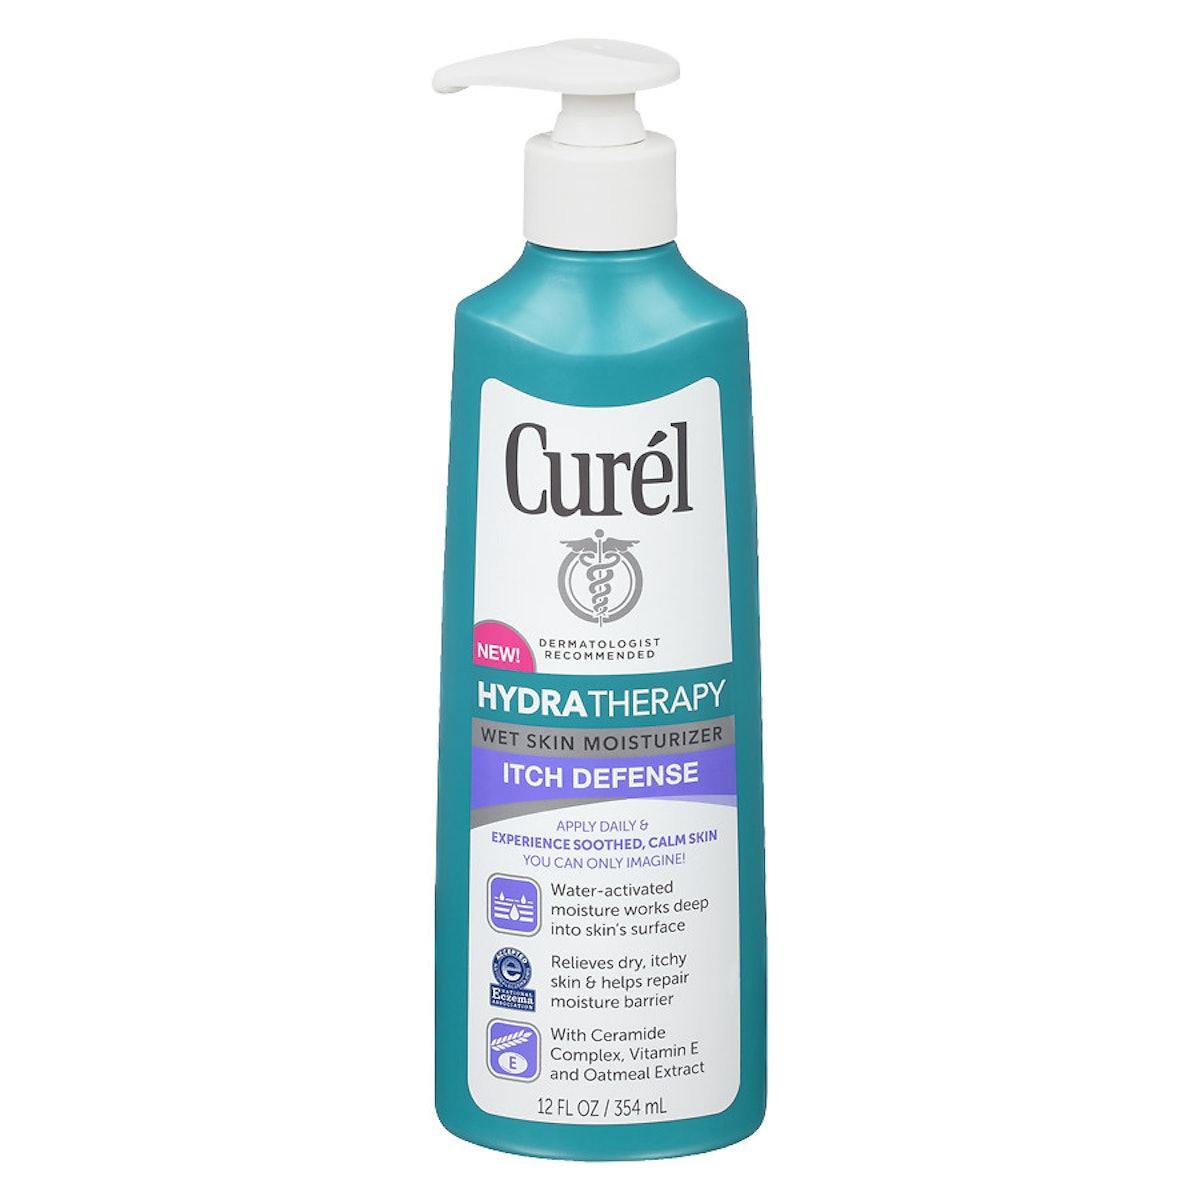 Curél Hydra Therapy Itch Defense Wet Skin Moisturizer